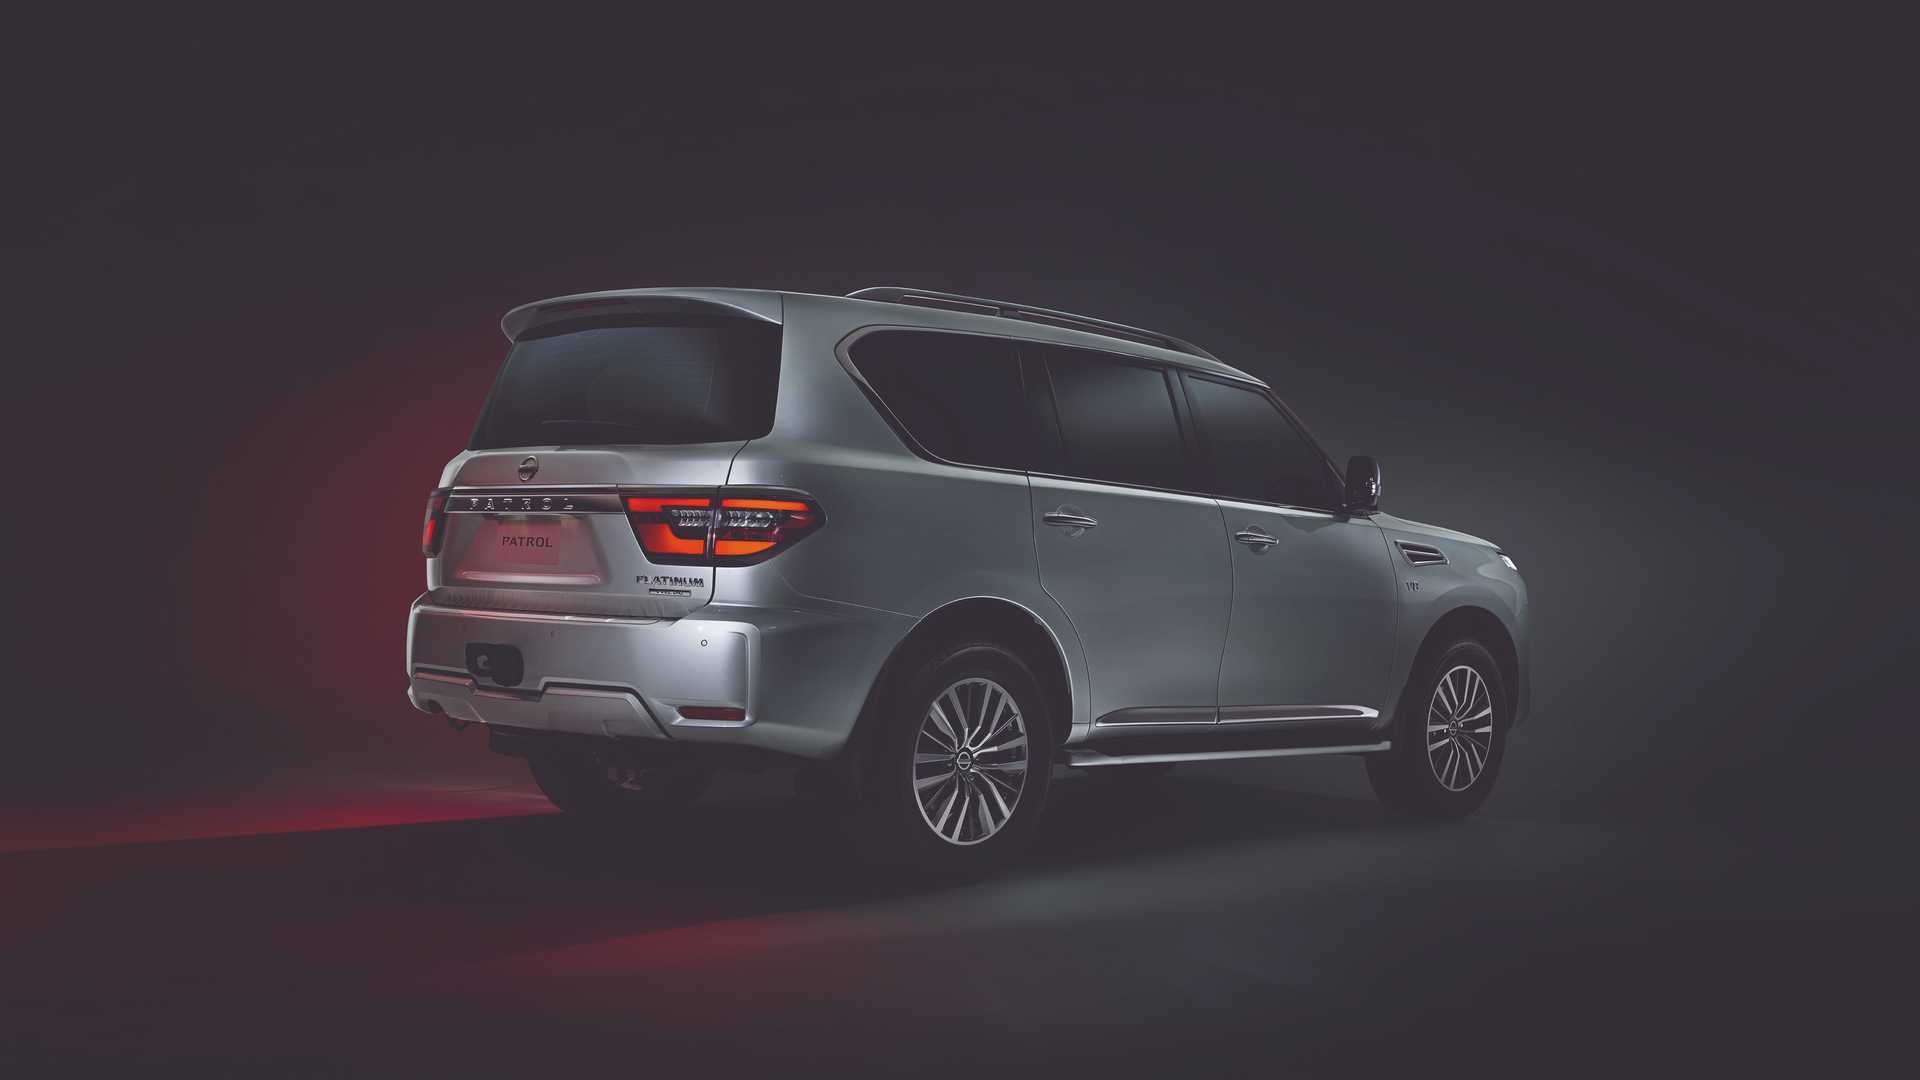 2020 Nissan Patrol Debuts Fresh Look Two Screen Infotainment Display